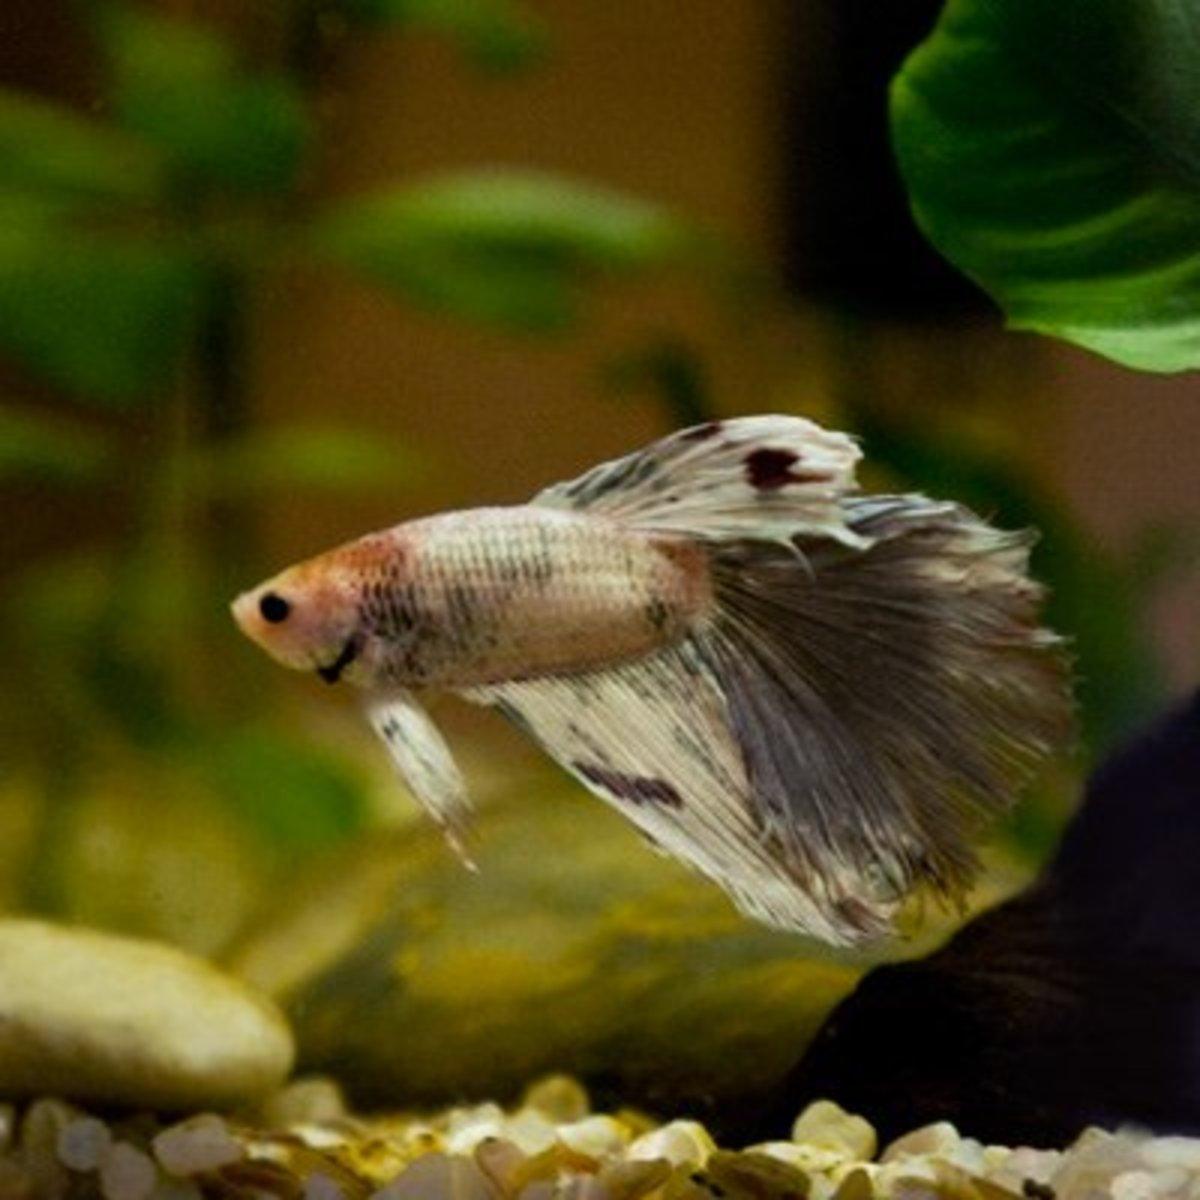 Best heaters for a 5 gallon freshwater aquarium fish tank for Betta fish water temp